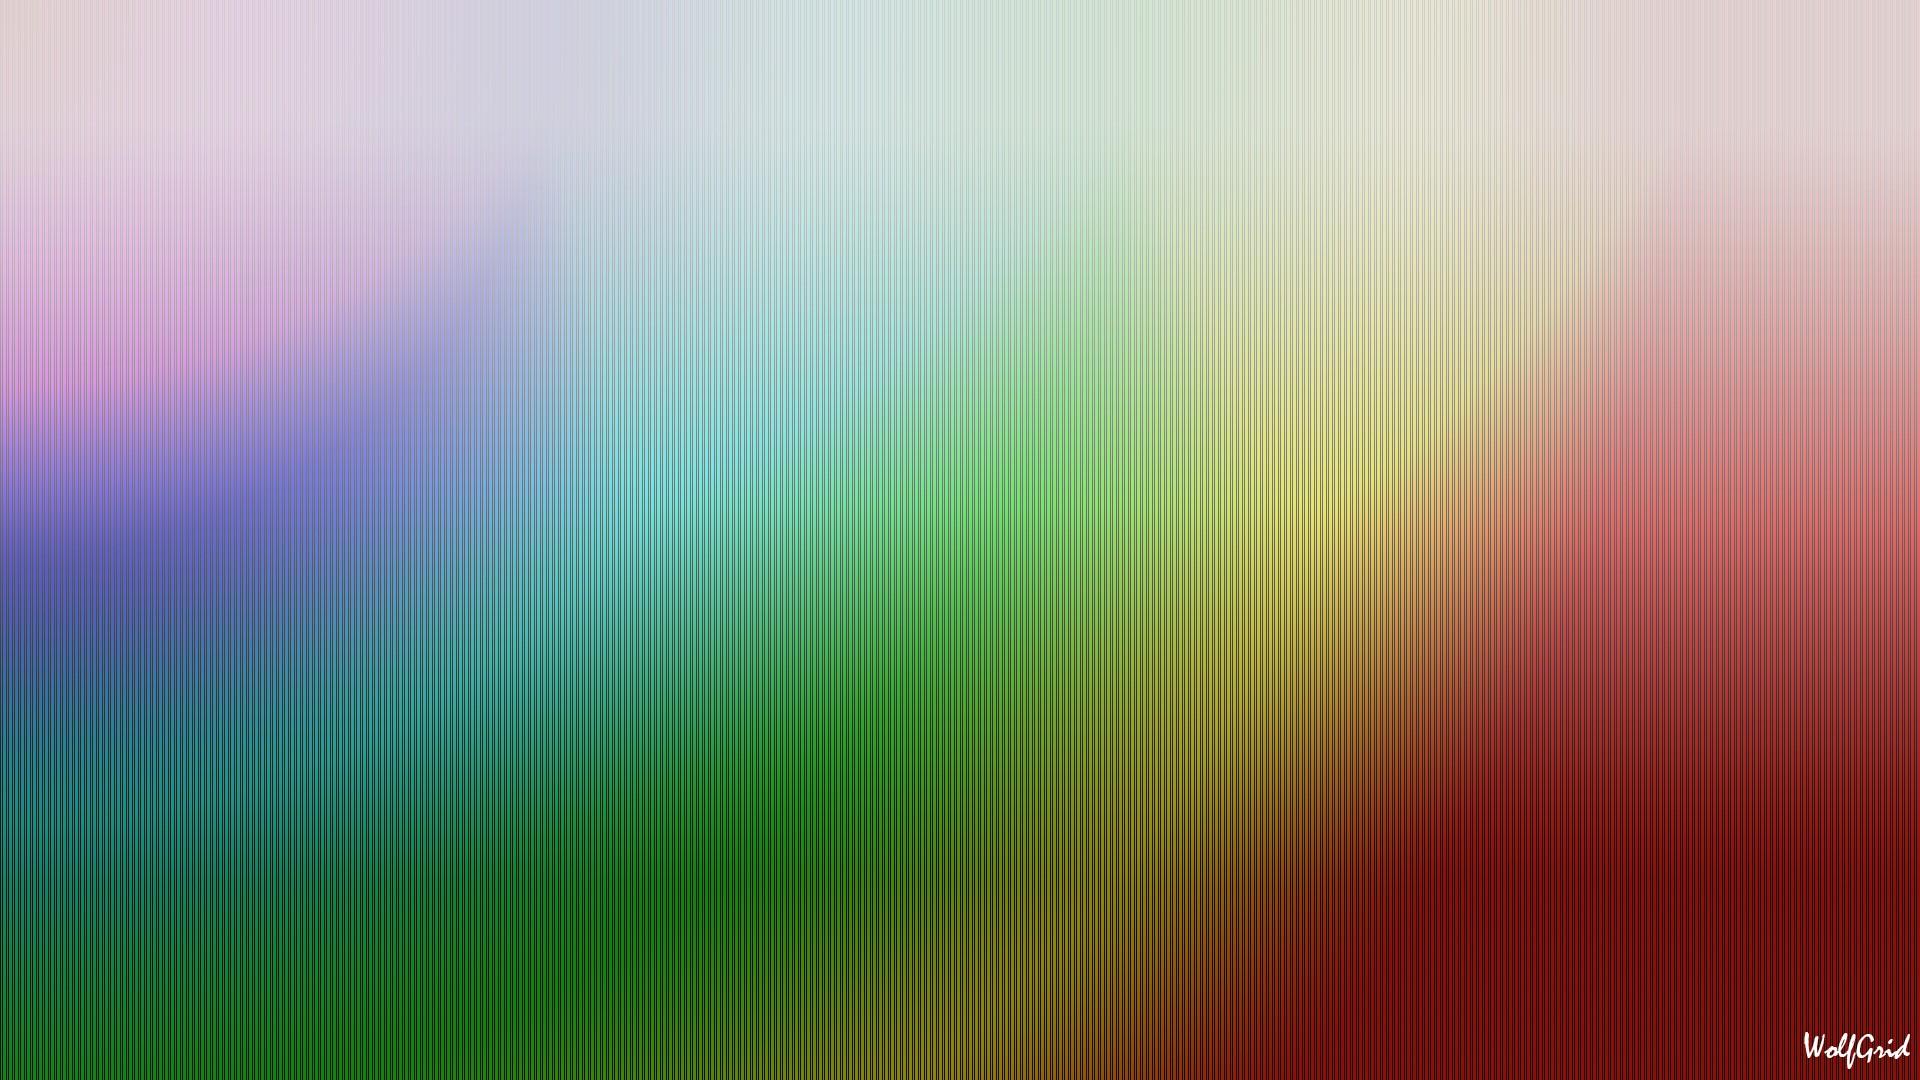 300+ Wallpaper Abstrak Warna Hijau  Paling Baru